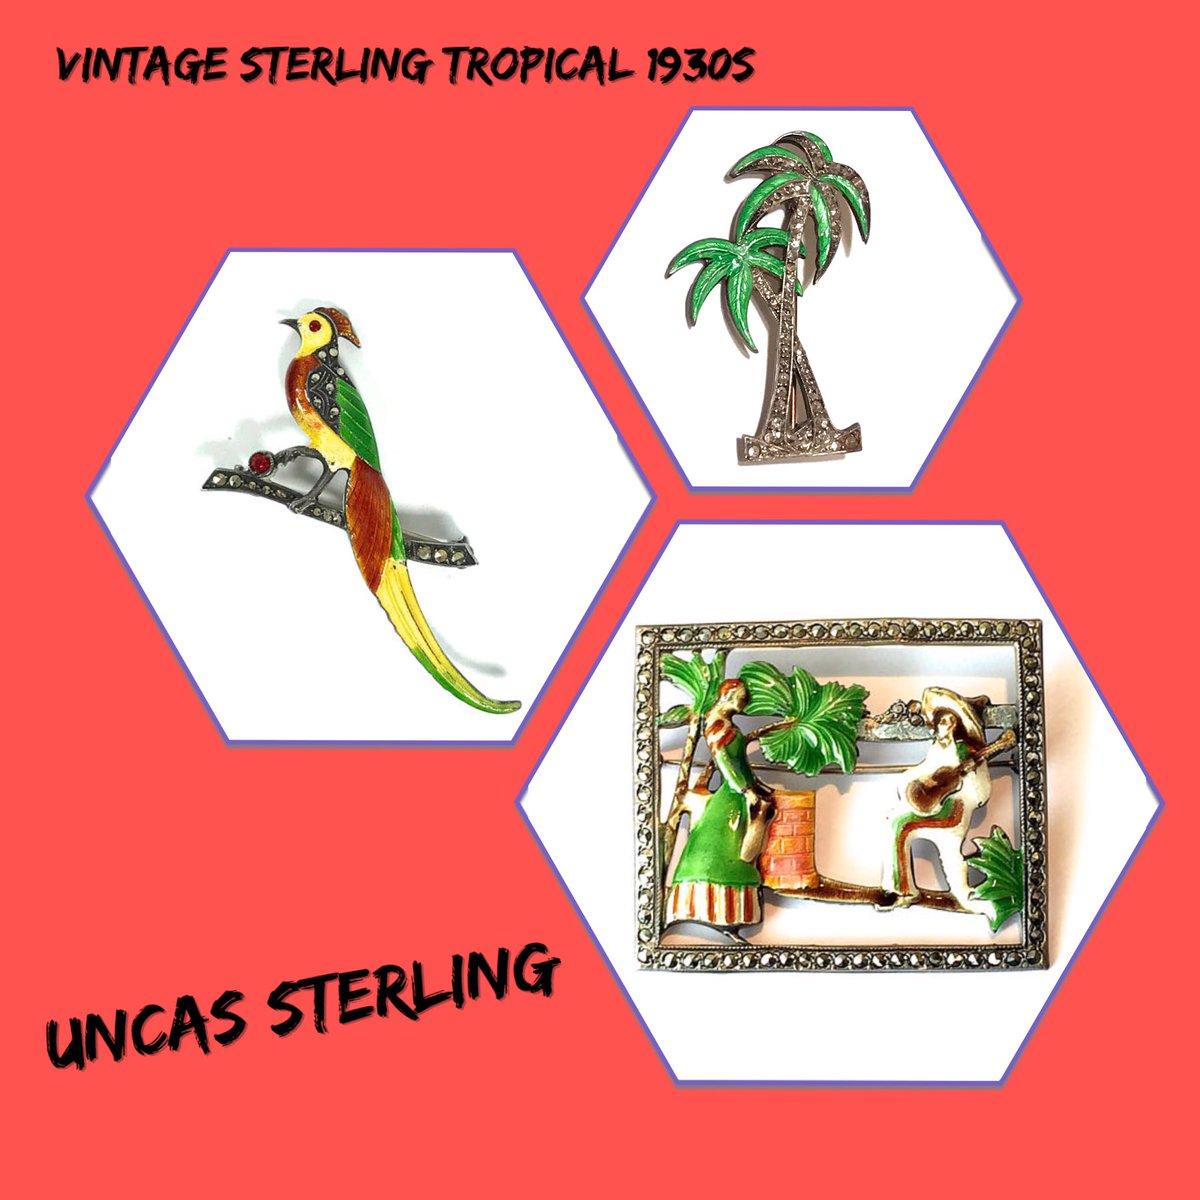 http://www. etsy.com/shop/justvinta ge4u &nbsp; …   Etsy listing  http://www. etsy.com/listing/545838 309 &nbsp; …  #vintage #antique #jewelry #artdeco<br>http://pic.twitter.com/zprdQbhCn5